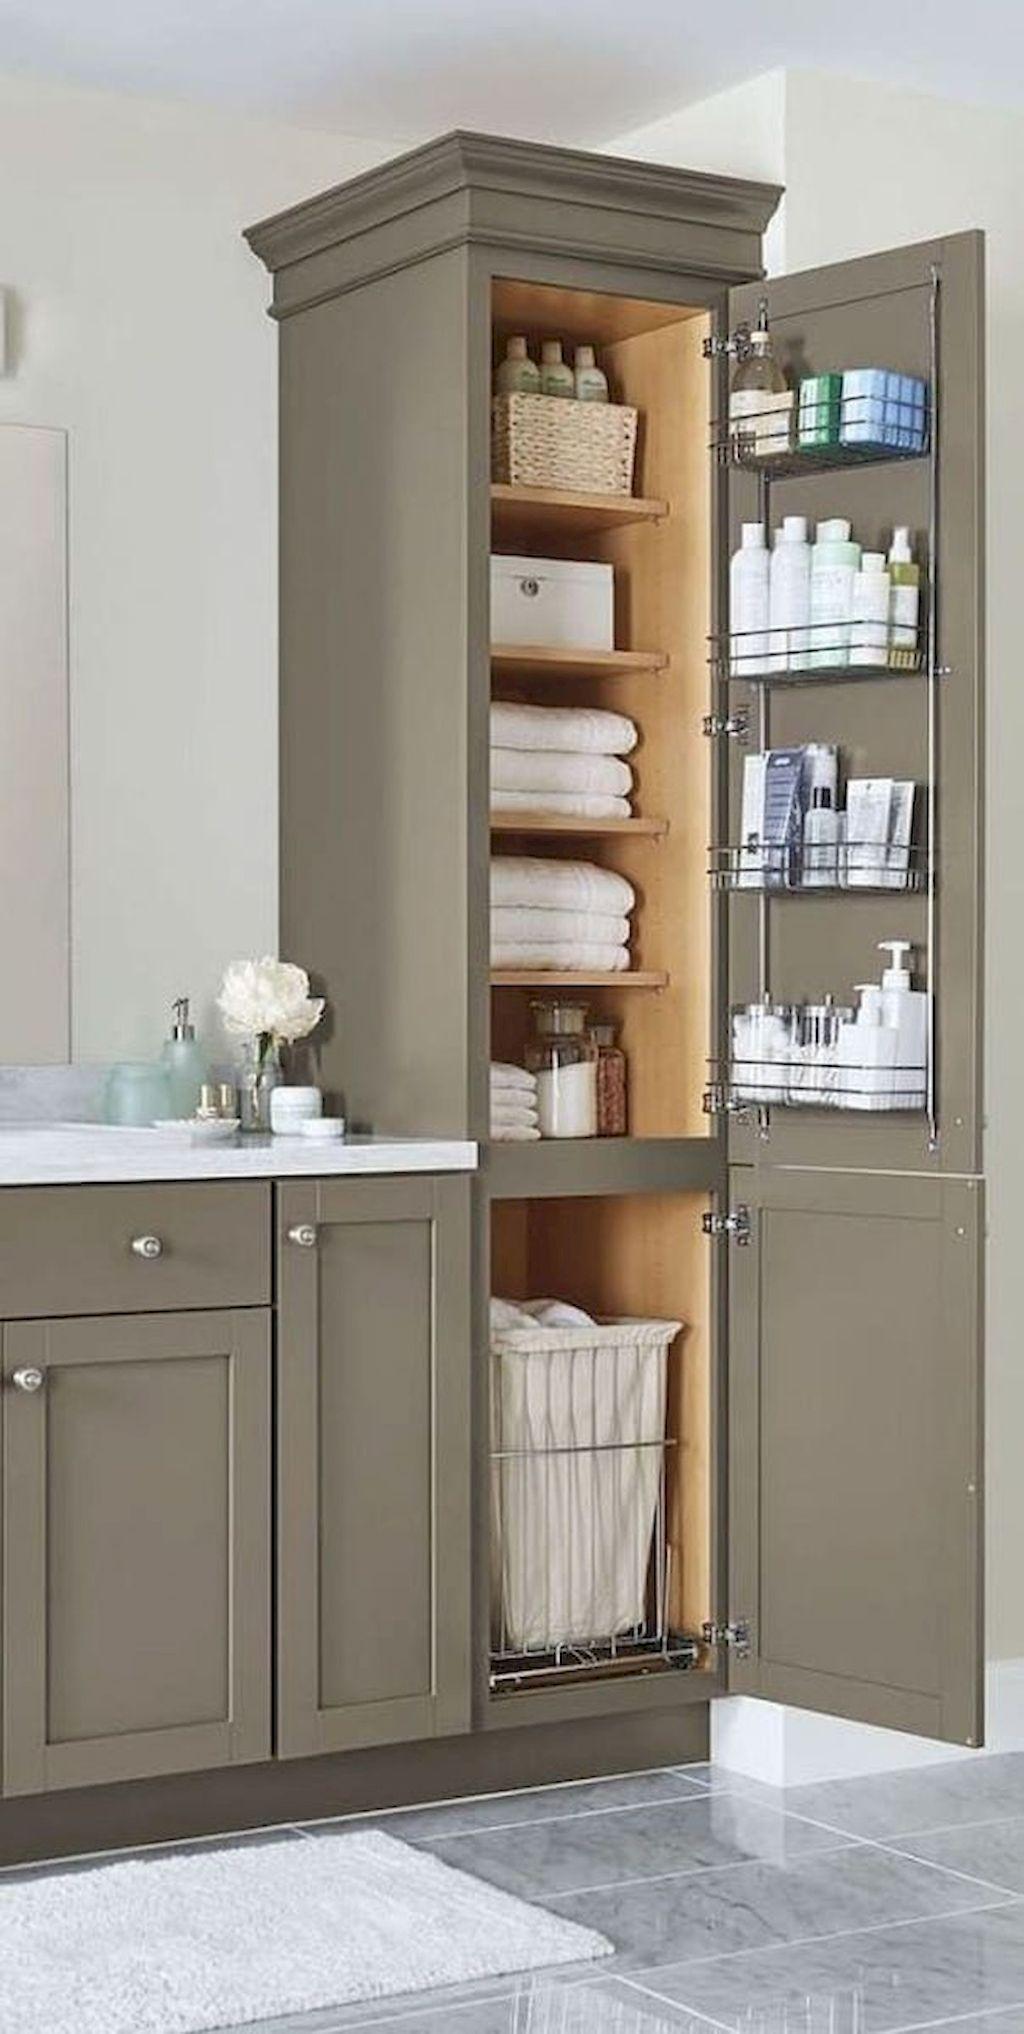 Master bedroom ensuite ideas   Stylish Master Bedroom Ideas u Remodeling Pictures  Bathrooms